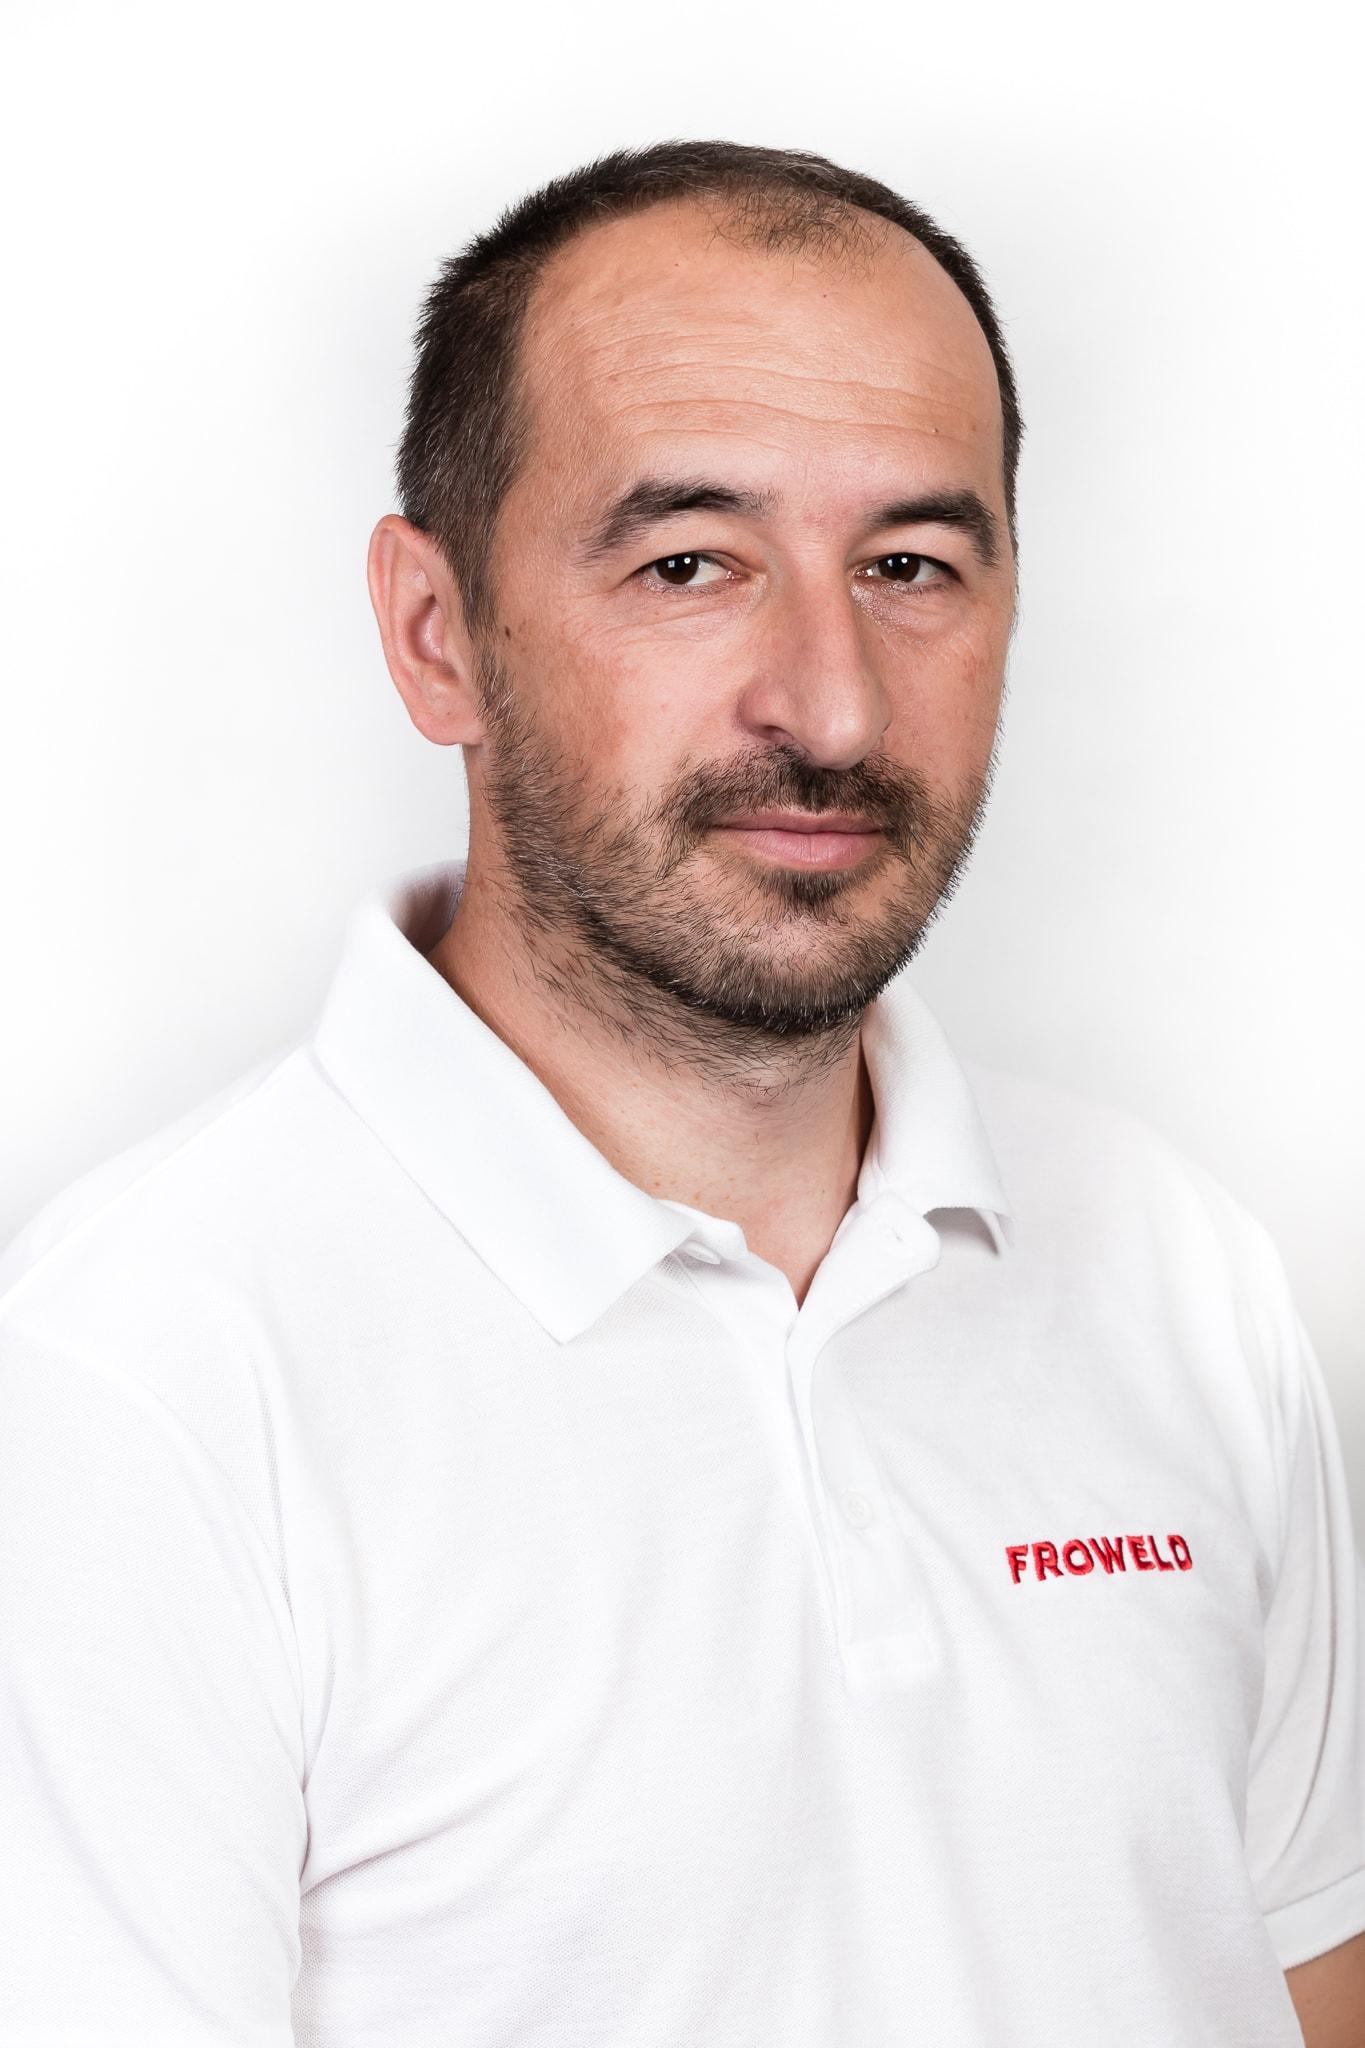 Peter Vilmos Froweld